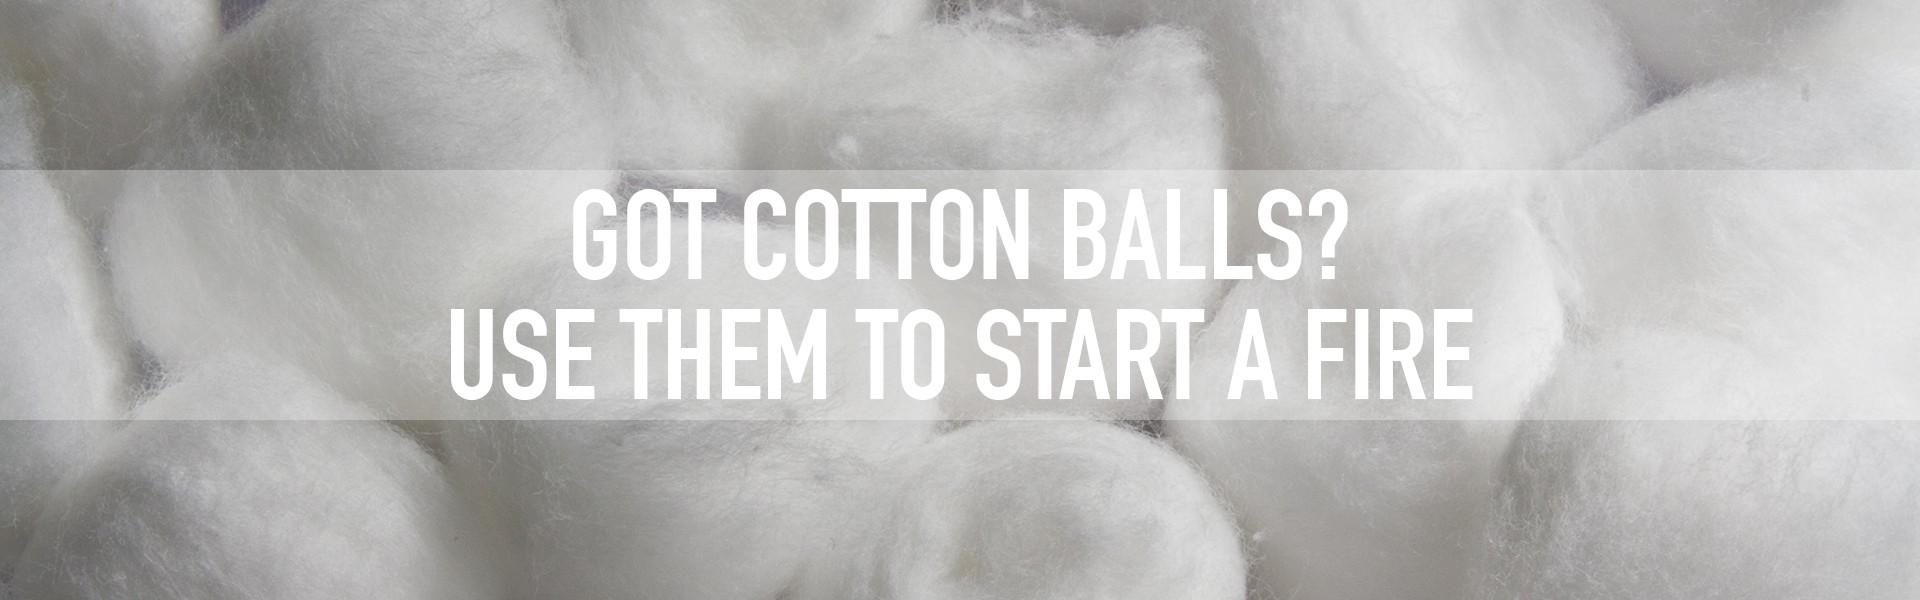 got cotton balls